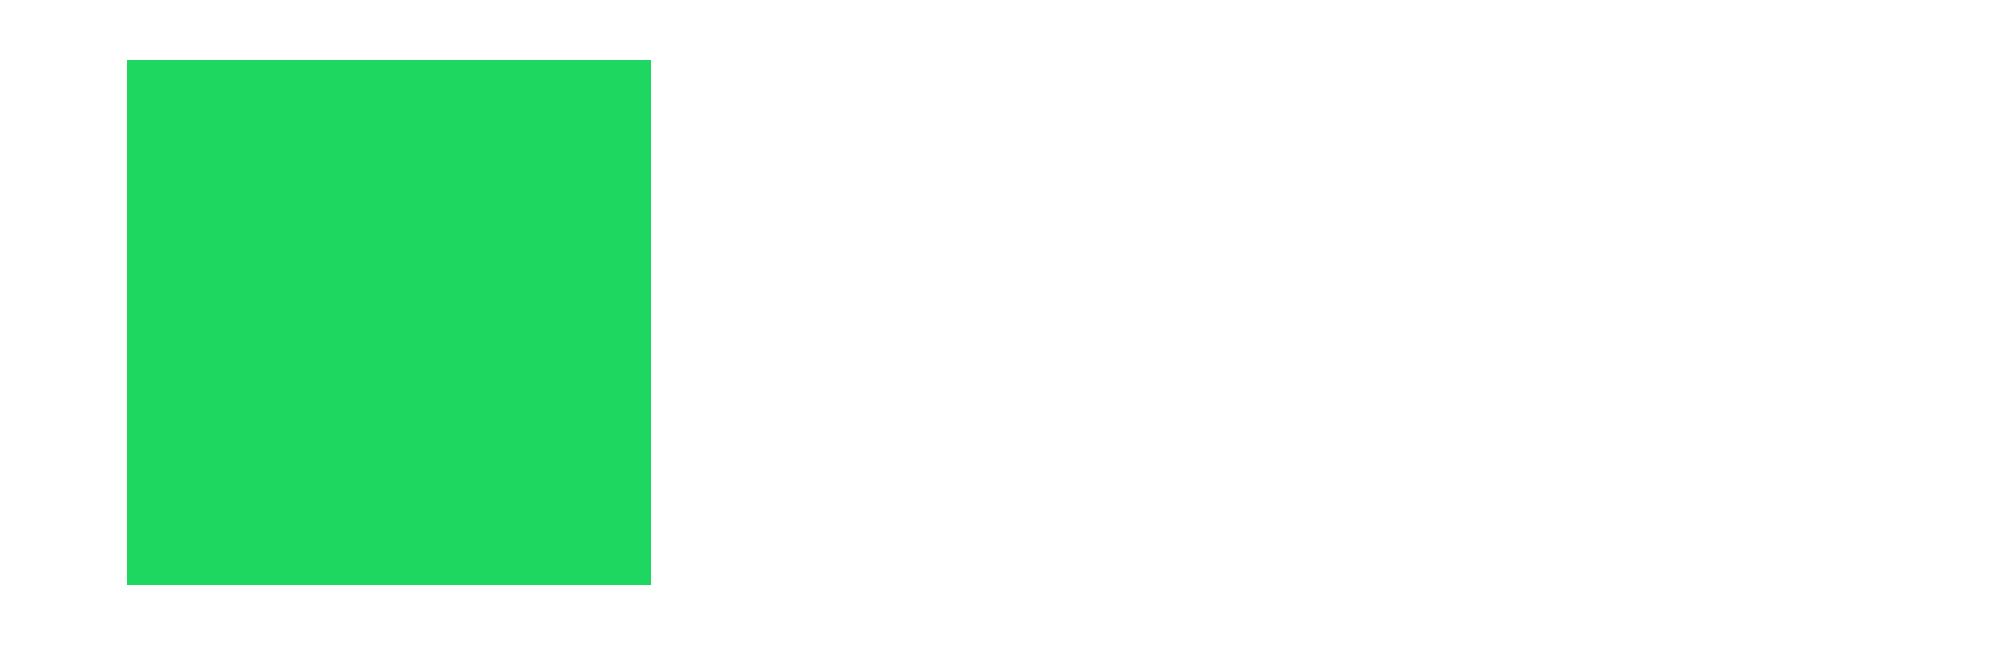 Sonia Liebing bei Spotify streamen